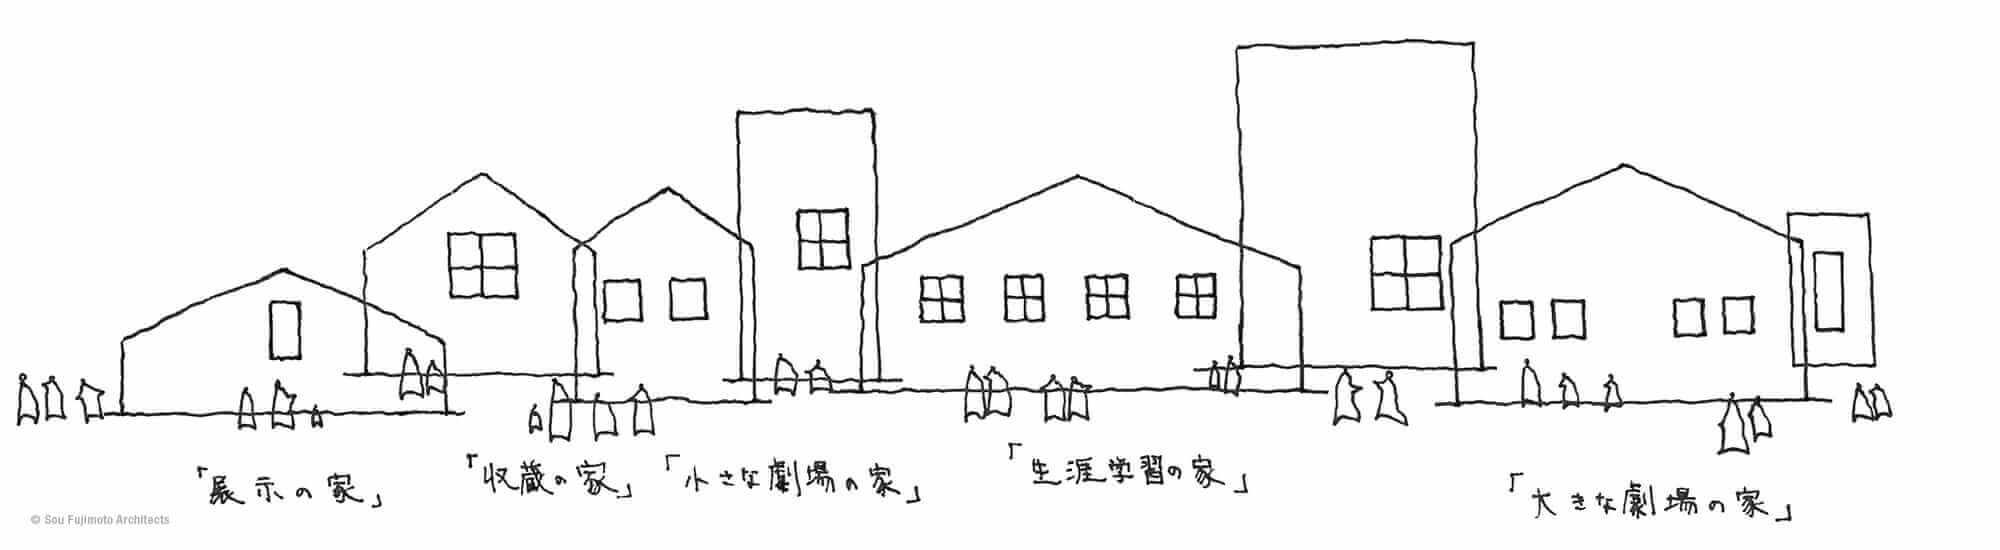 Drawings of Sou Fujimoto's Ishinomaki City Cultural Center.